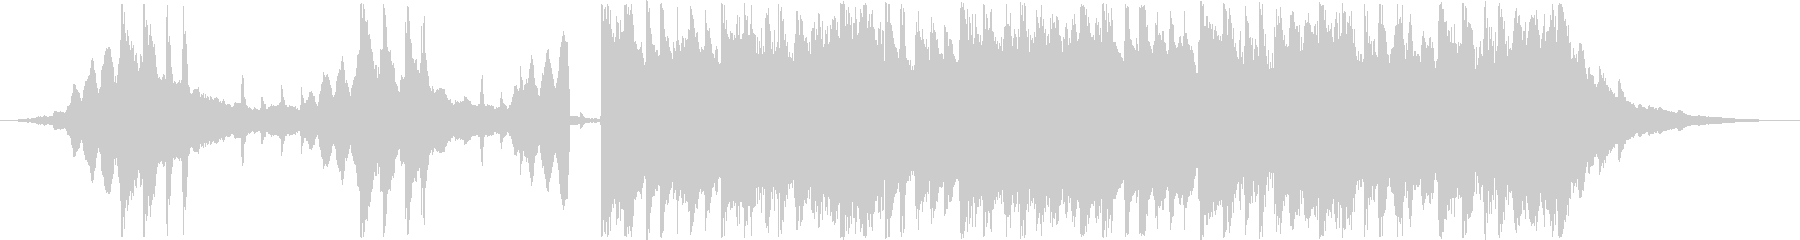 CM用30秒、次世代、スタイリッシュ製品の未再生の波形